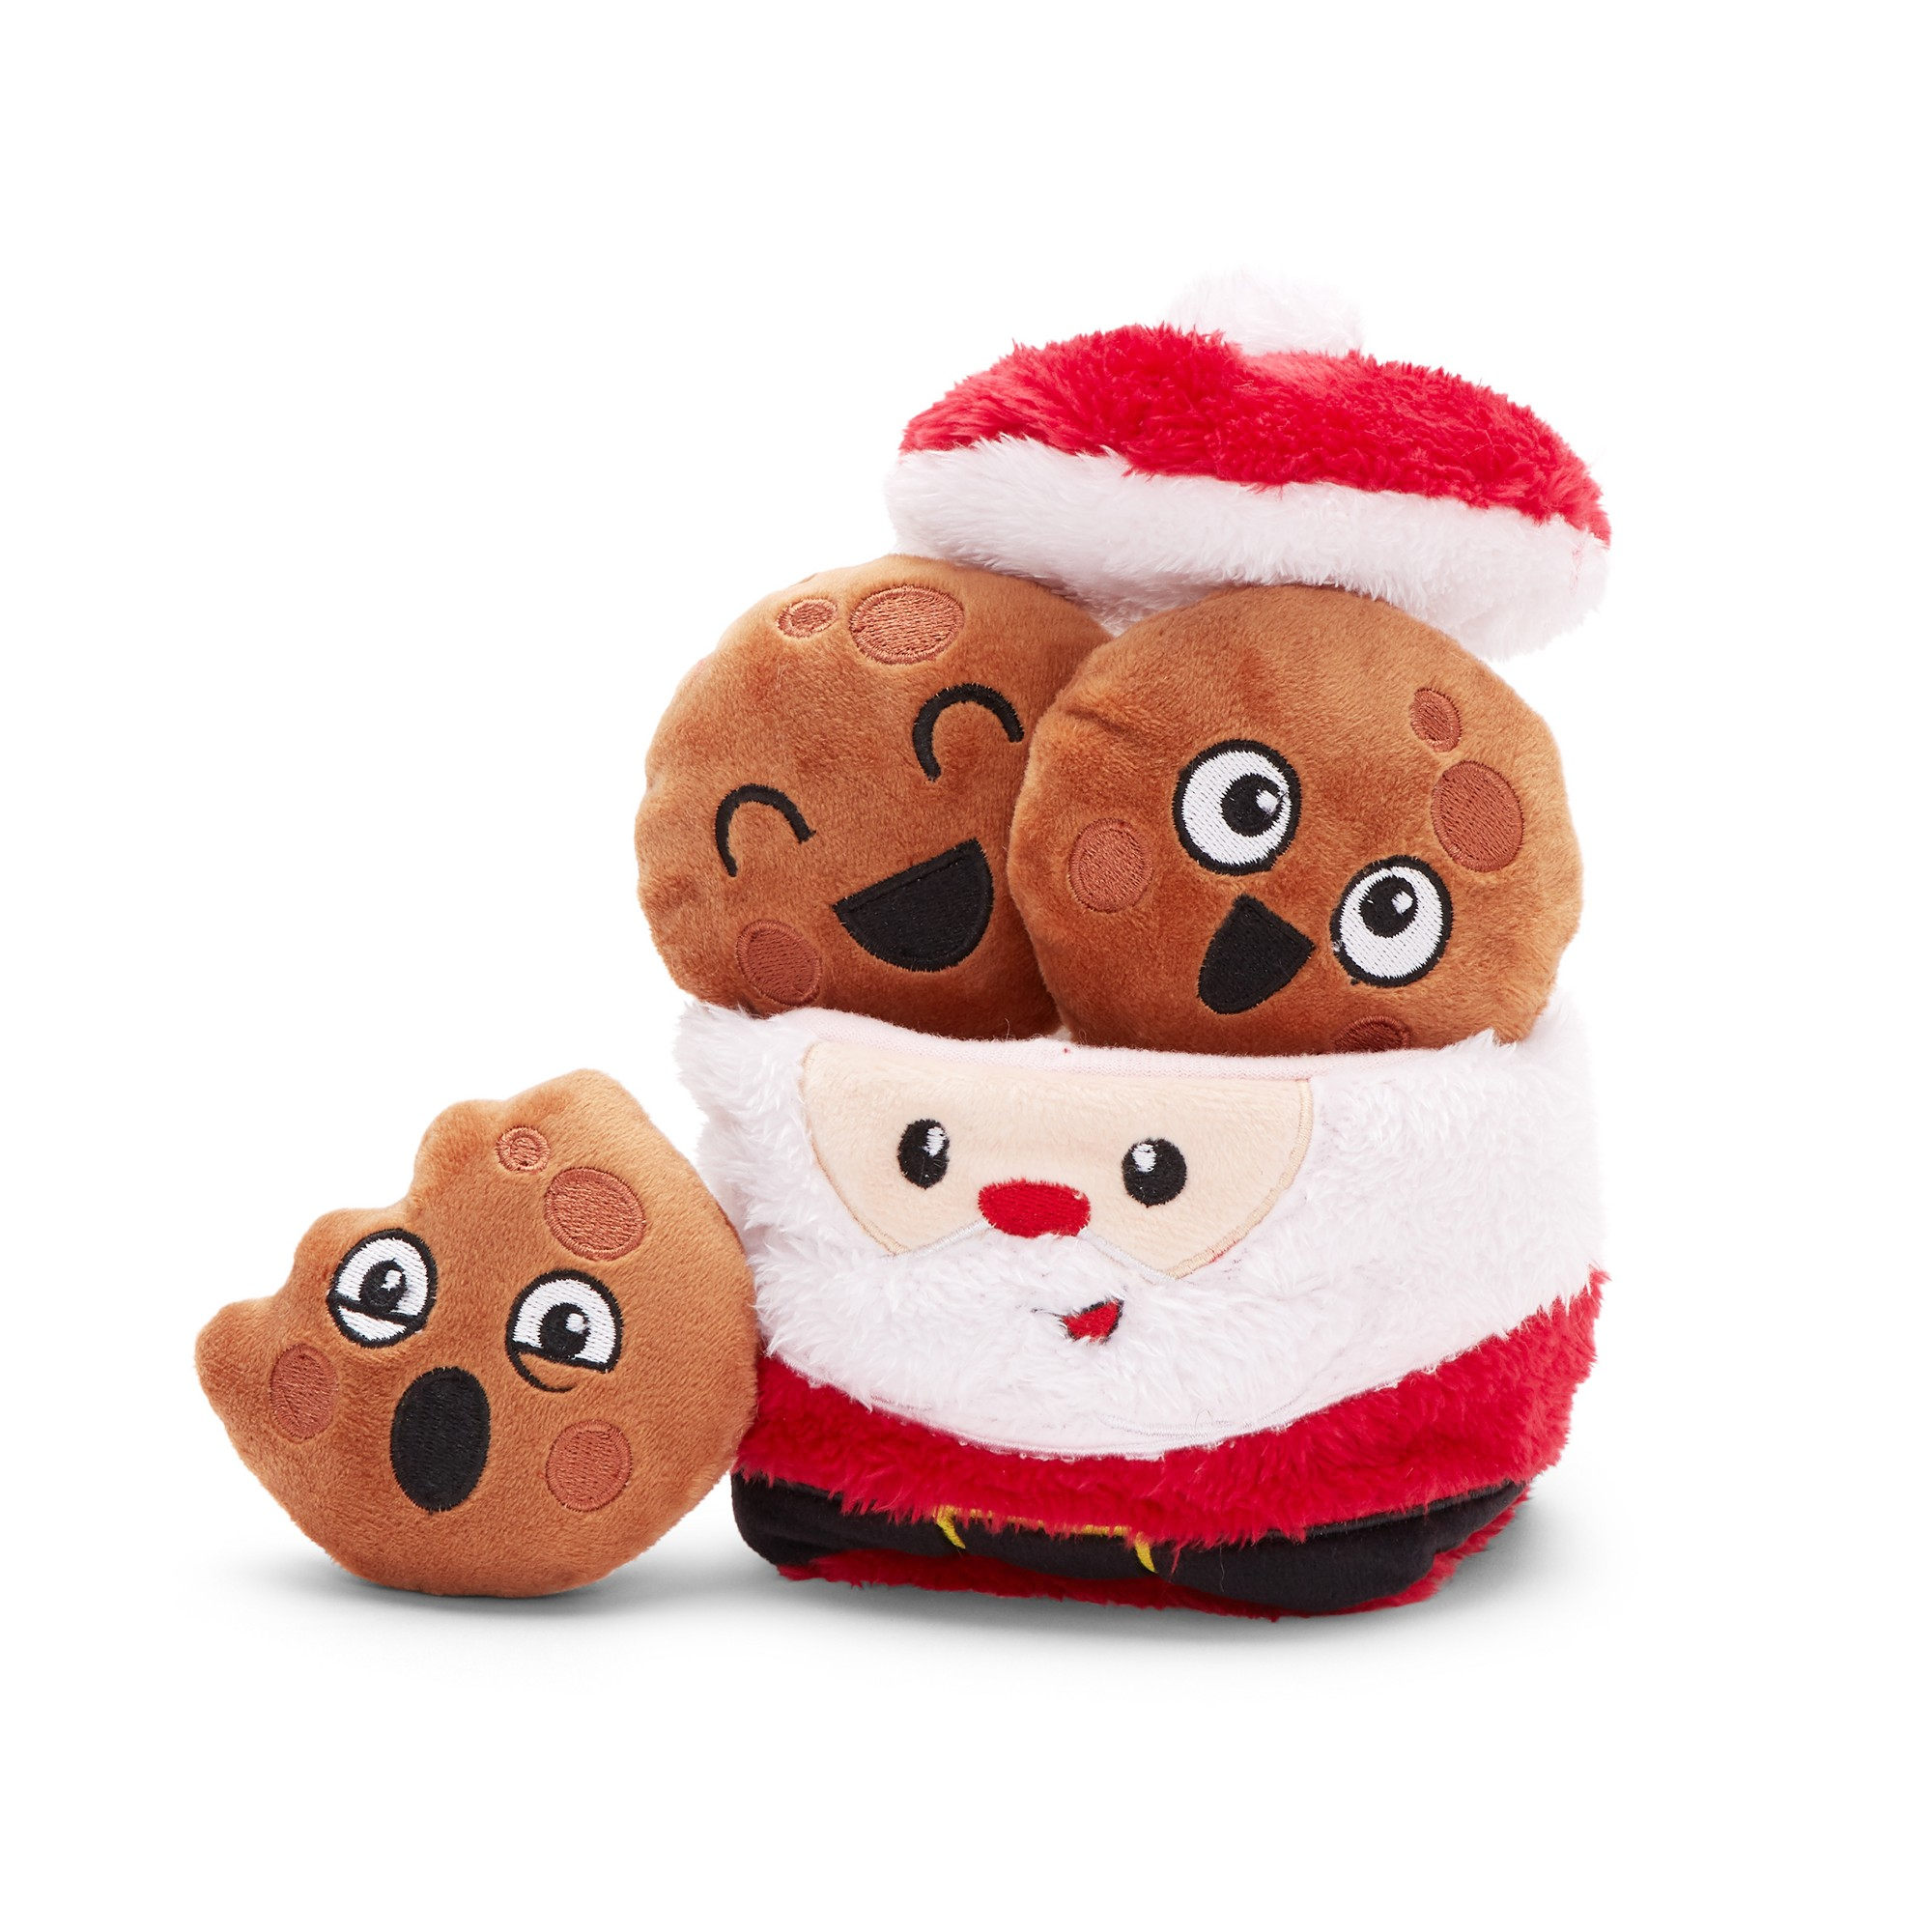 Bark Santa S Jolly Cookies Dog Toy Christmas Cookie Jars Dog